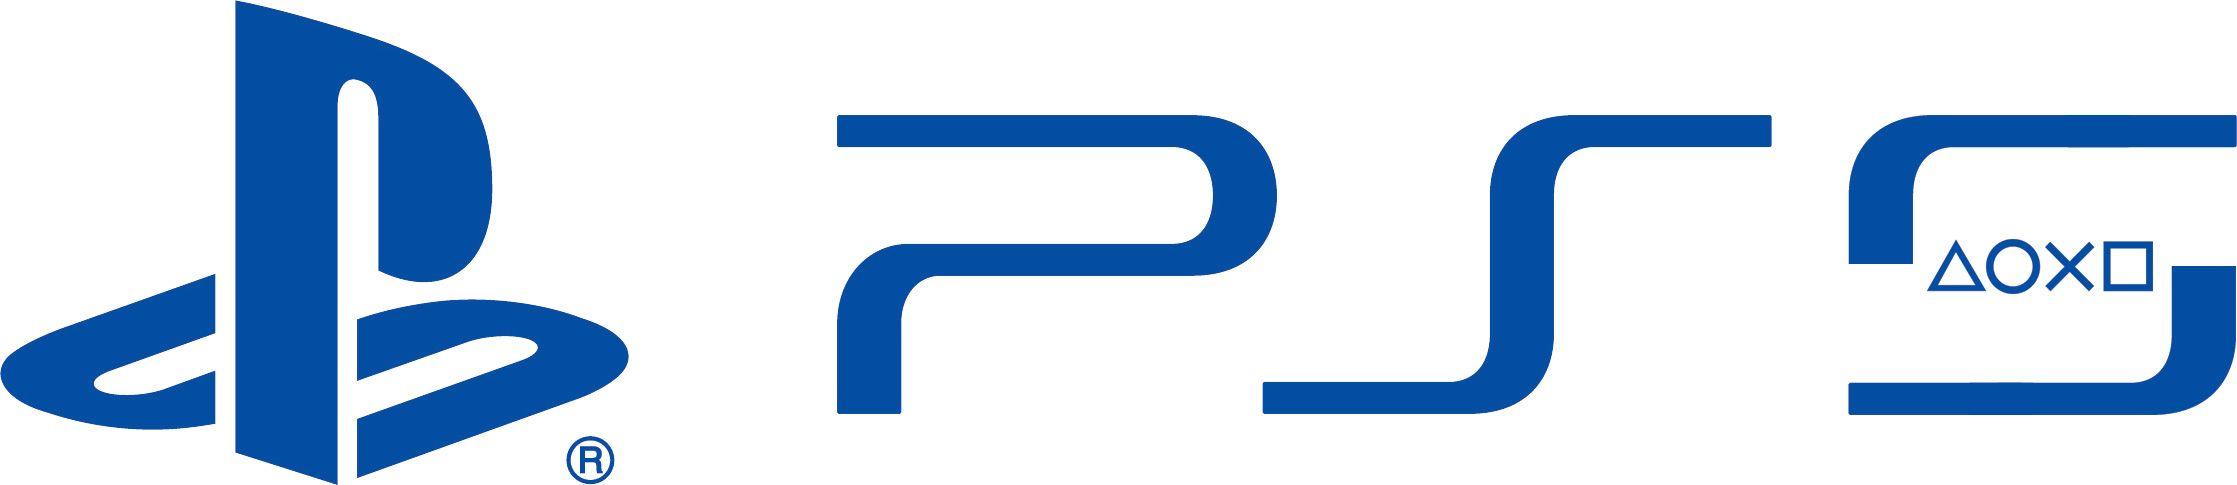 PS5 Logo Konzept